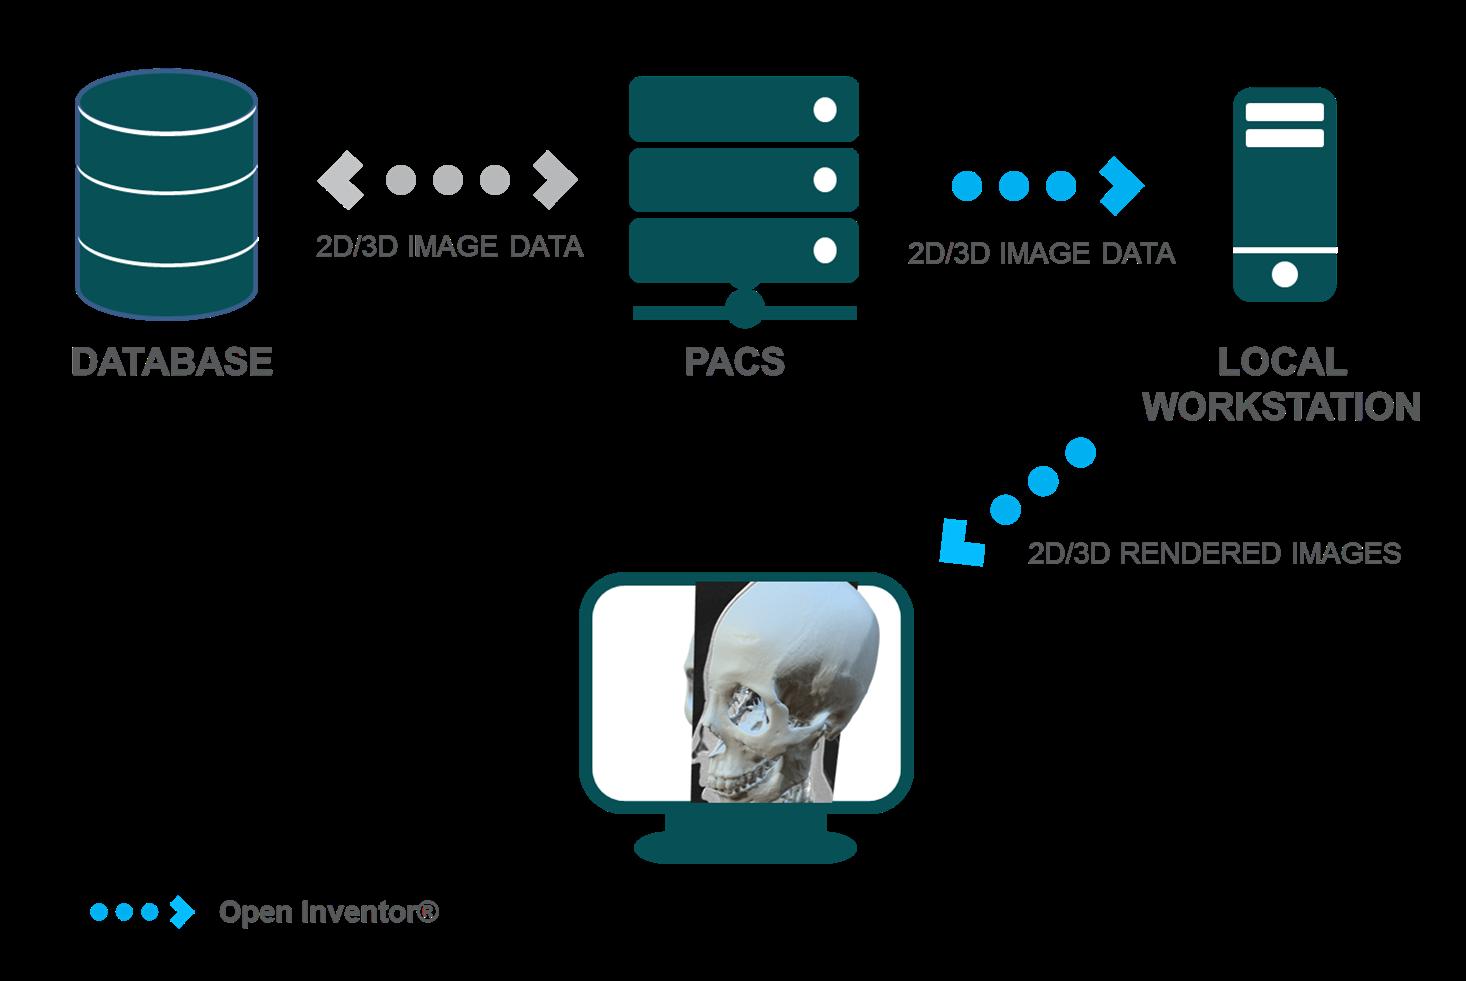 OpenInventor-Medical-PACS-2D-3D-rendering-simple_1